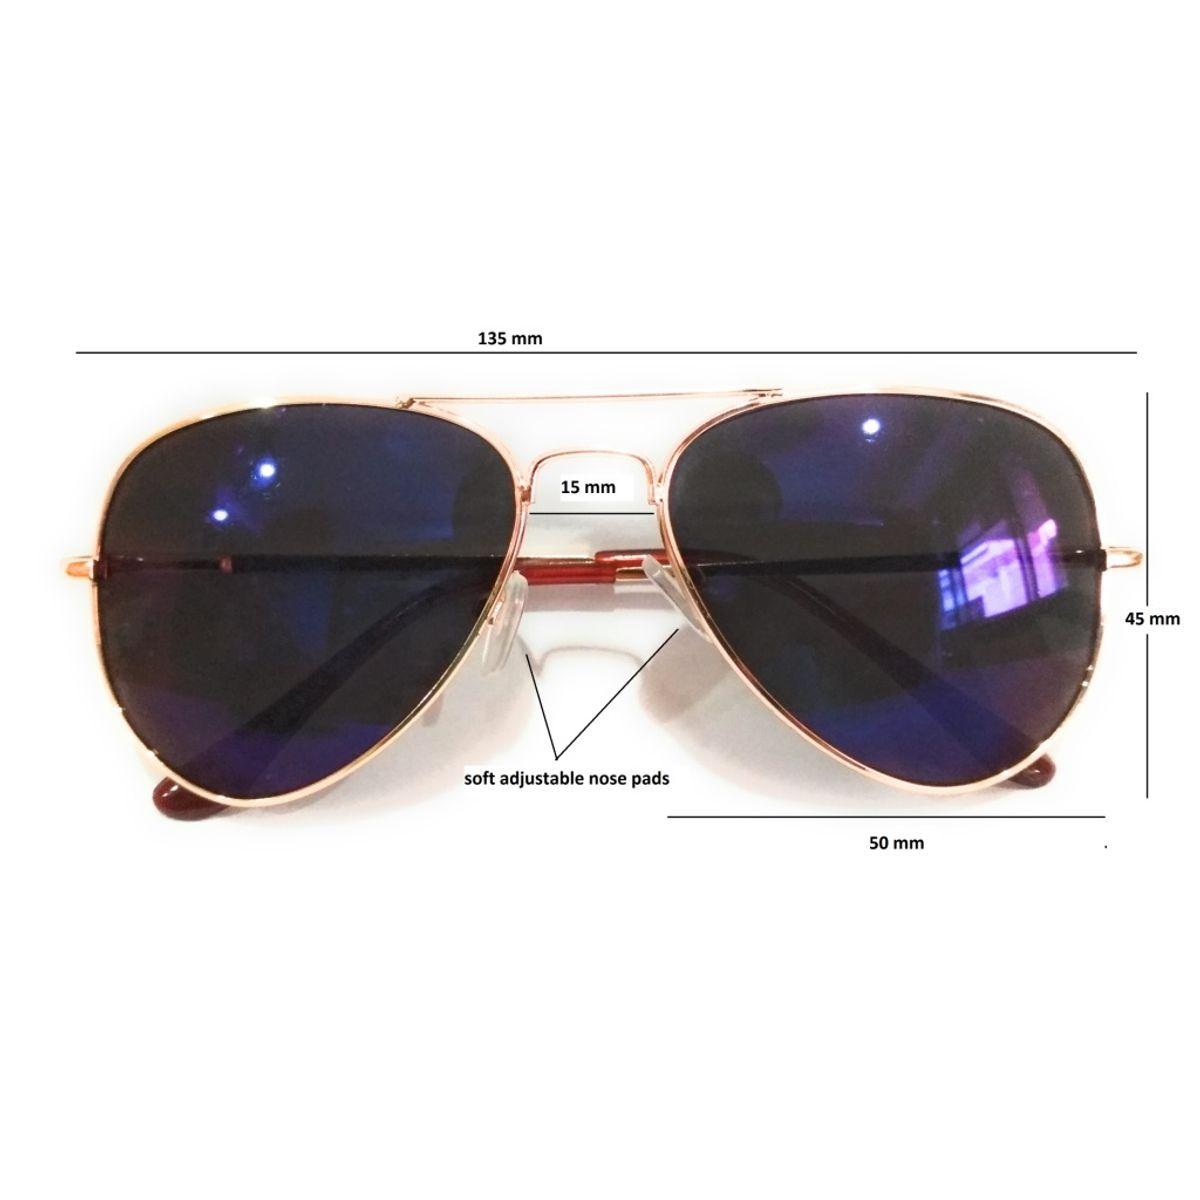 Aviator sunglasses for men women  blue aviator metal frame sunglasses.